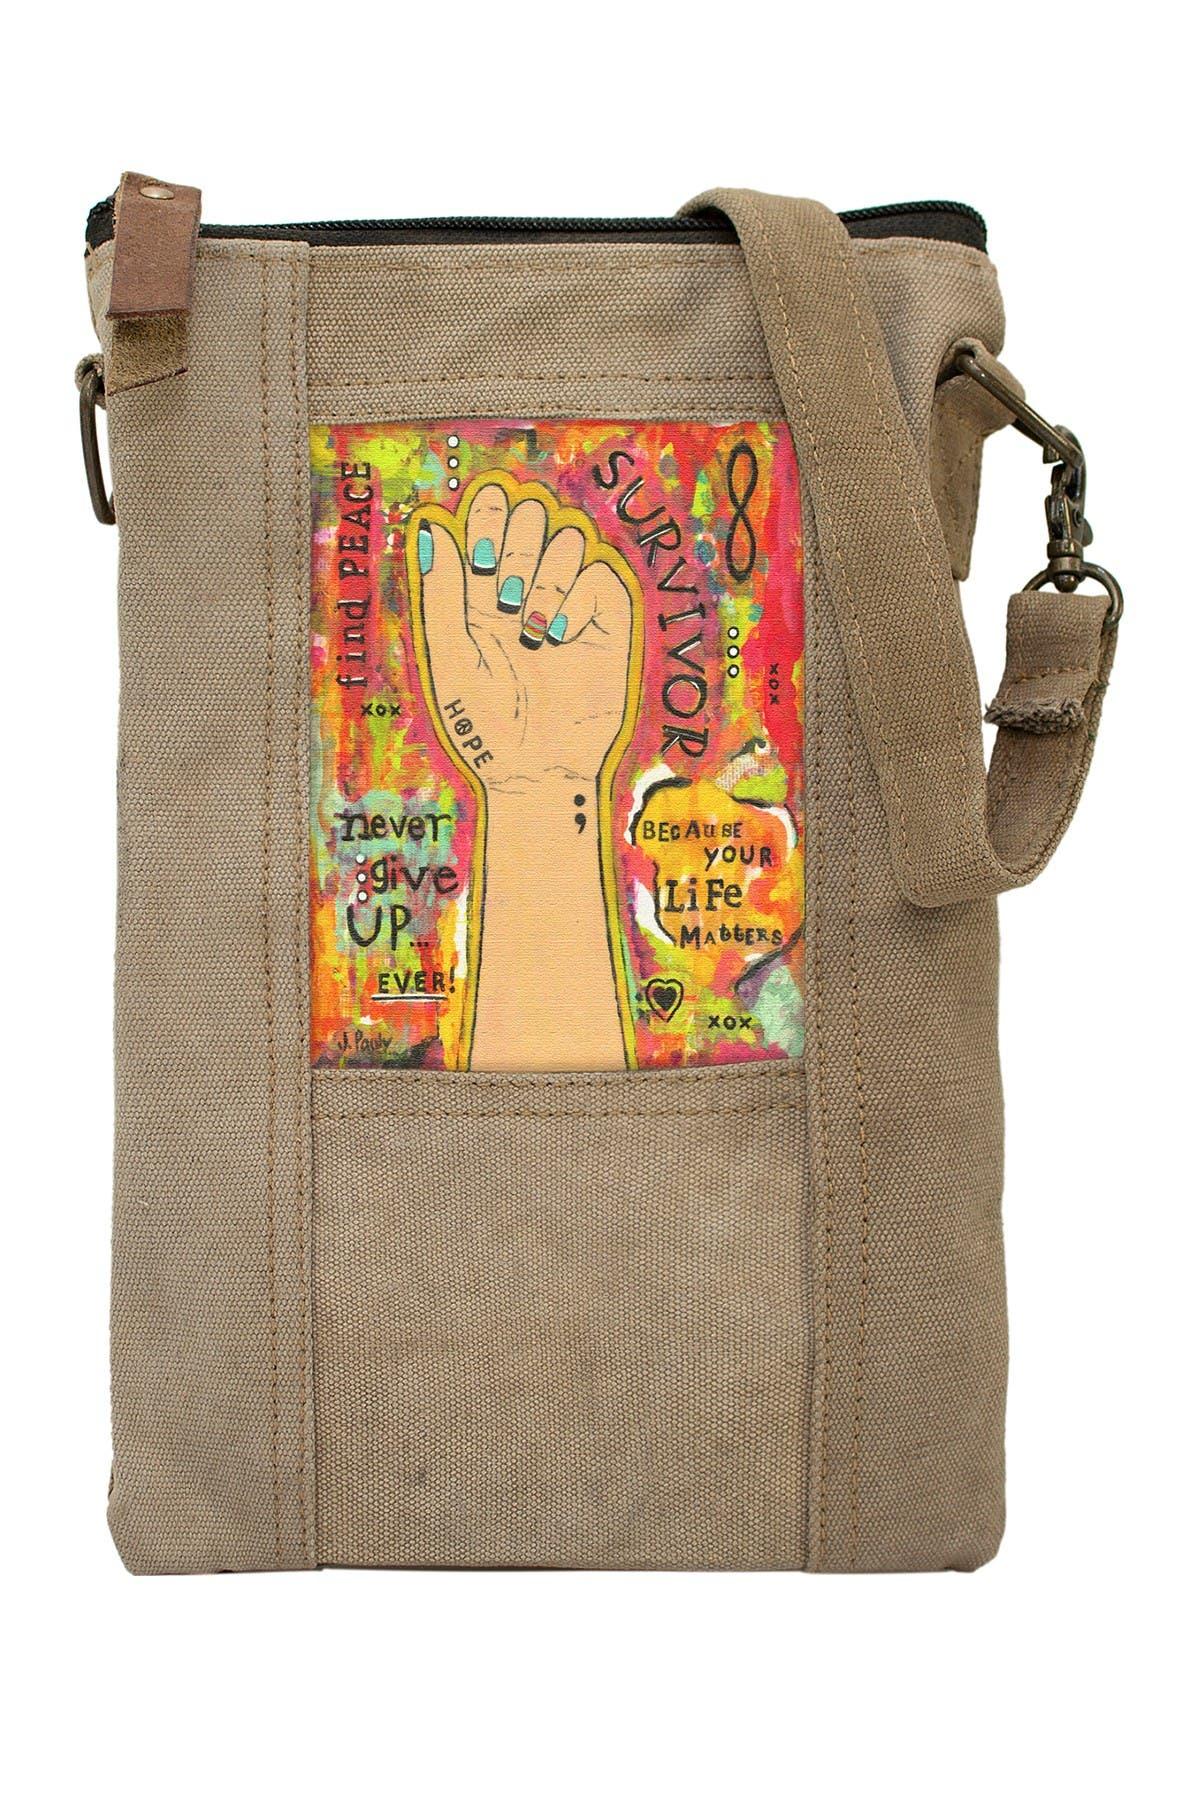 Image of Vintage Addiction Survivor Tent Crossbody Bag